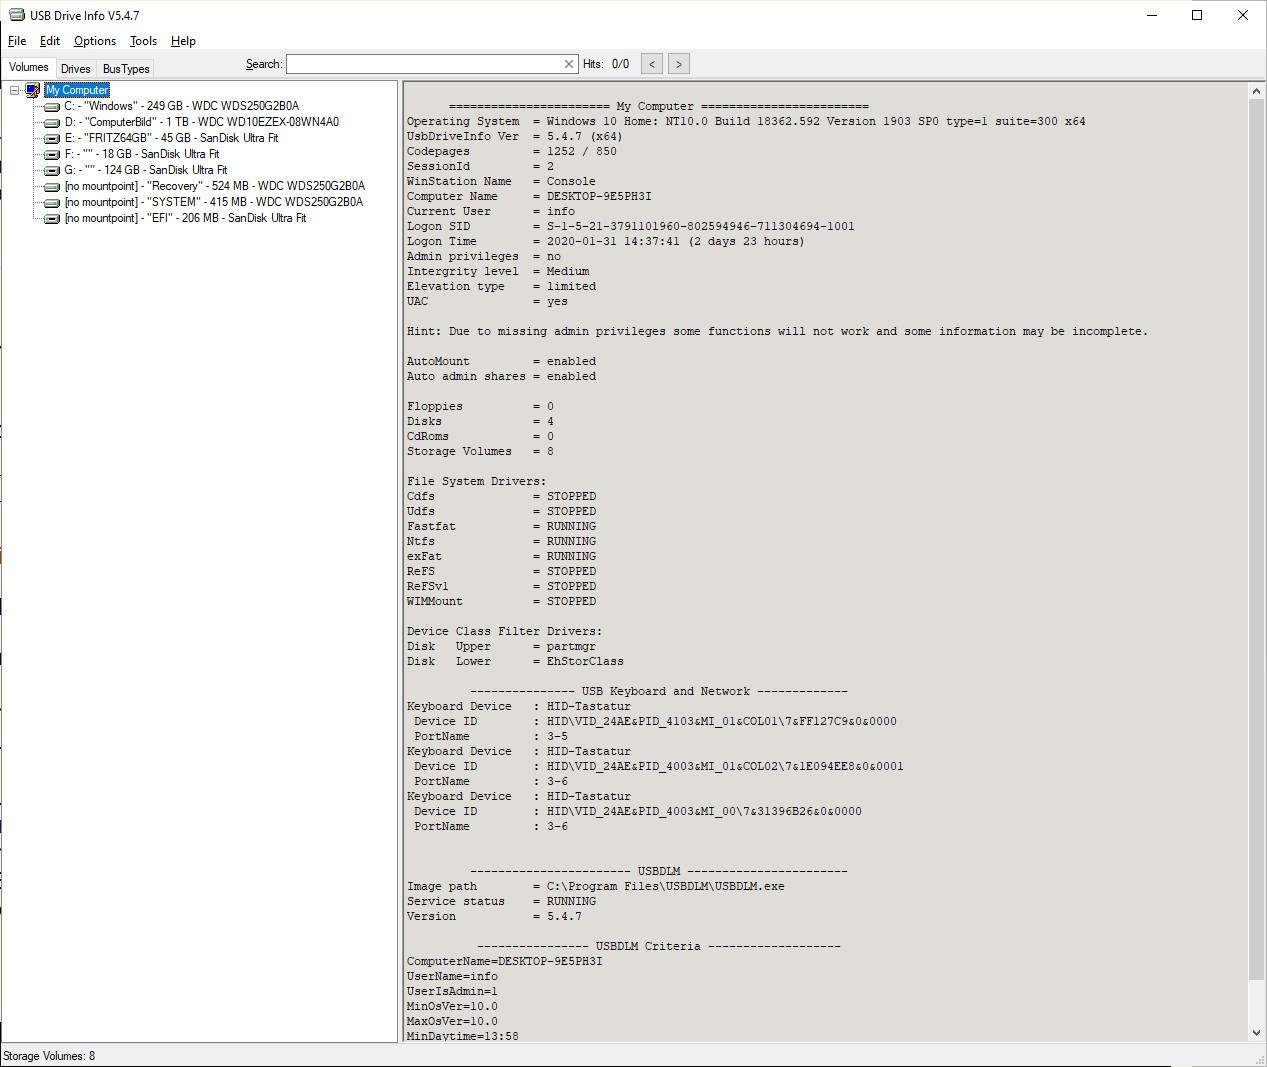 Screenshot 1 - USB Drive Letter Manager (USBDLM)